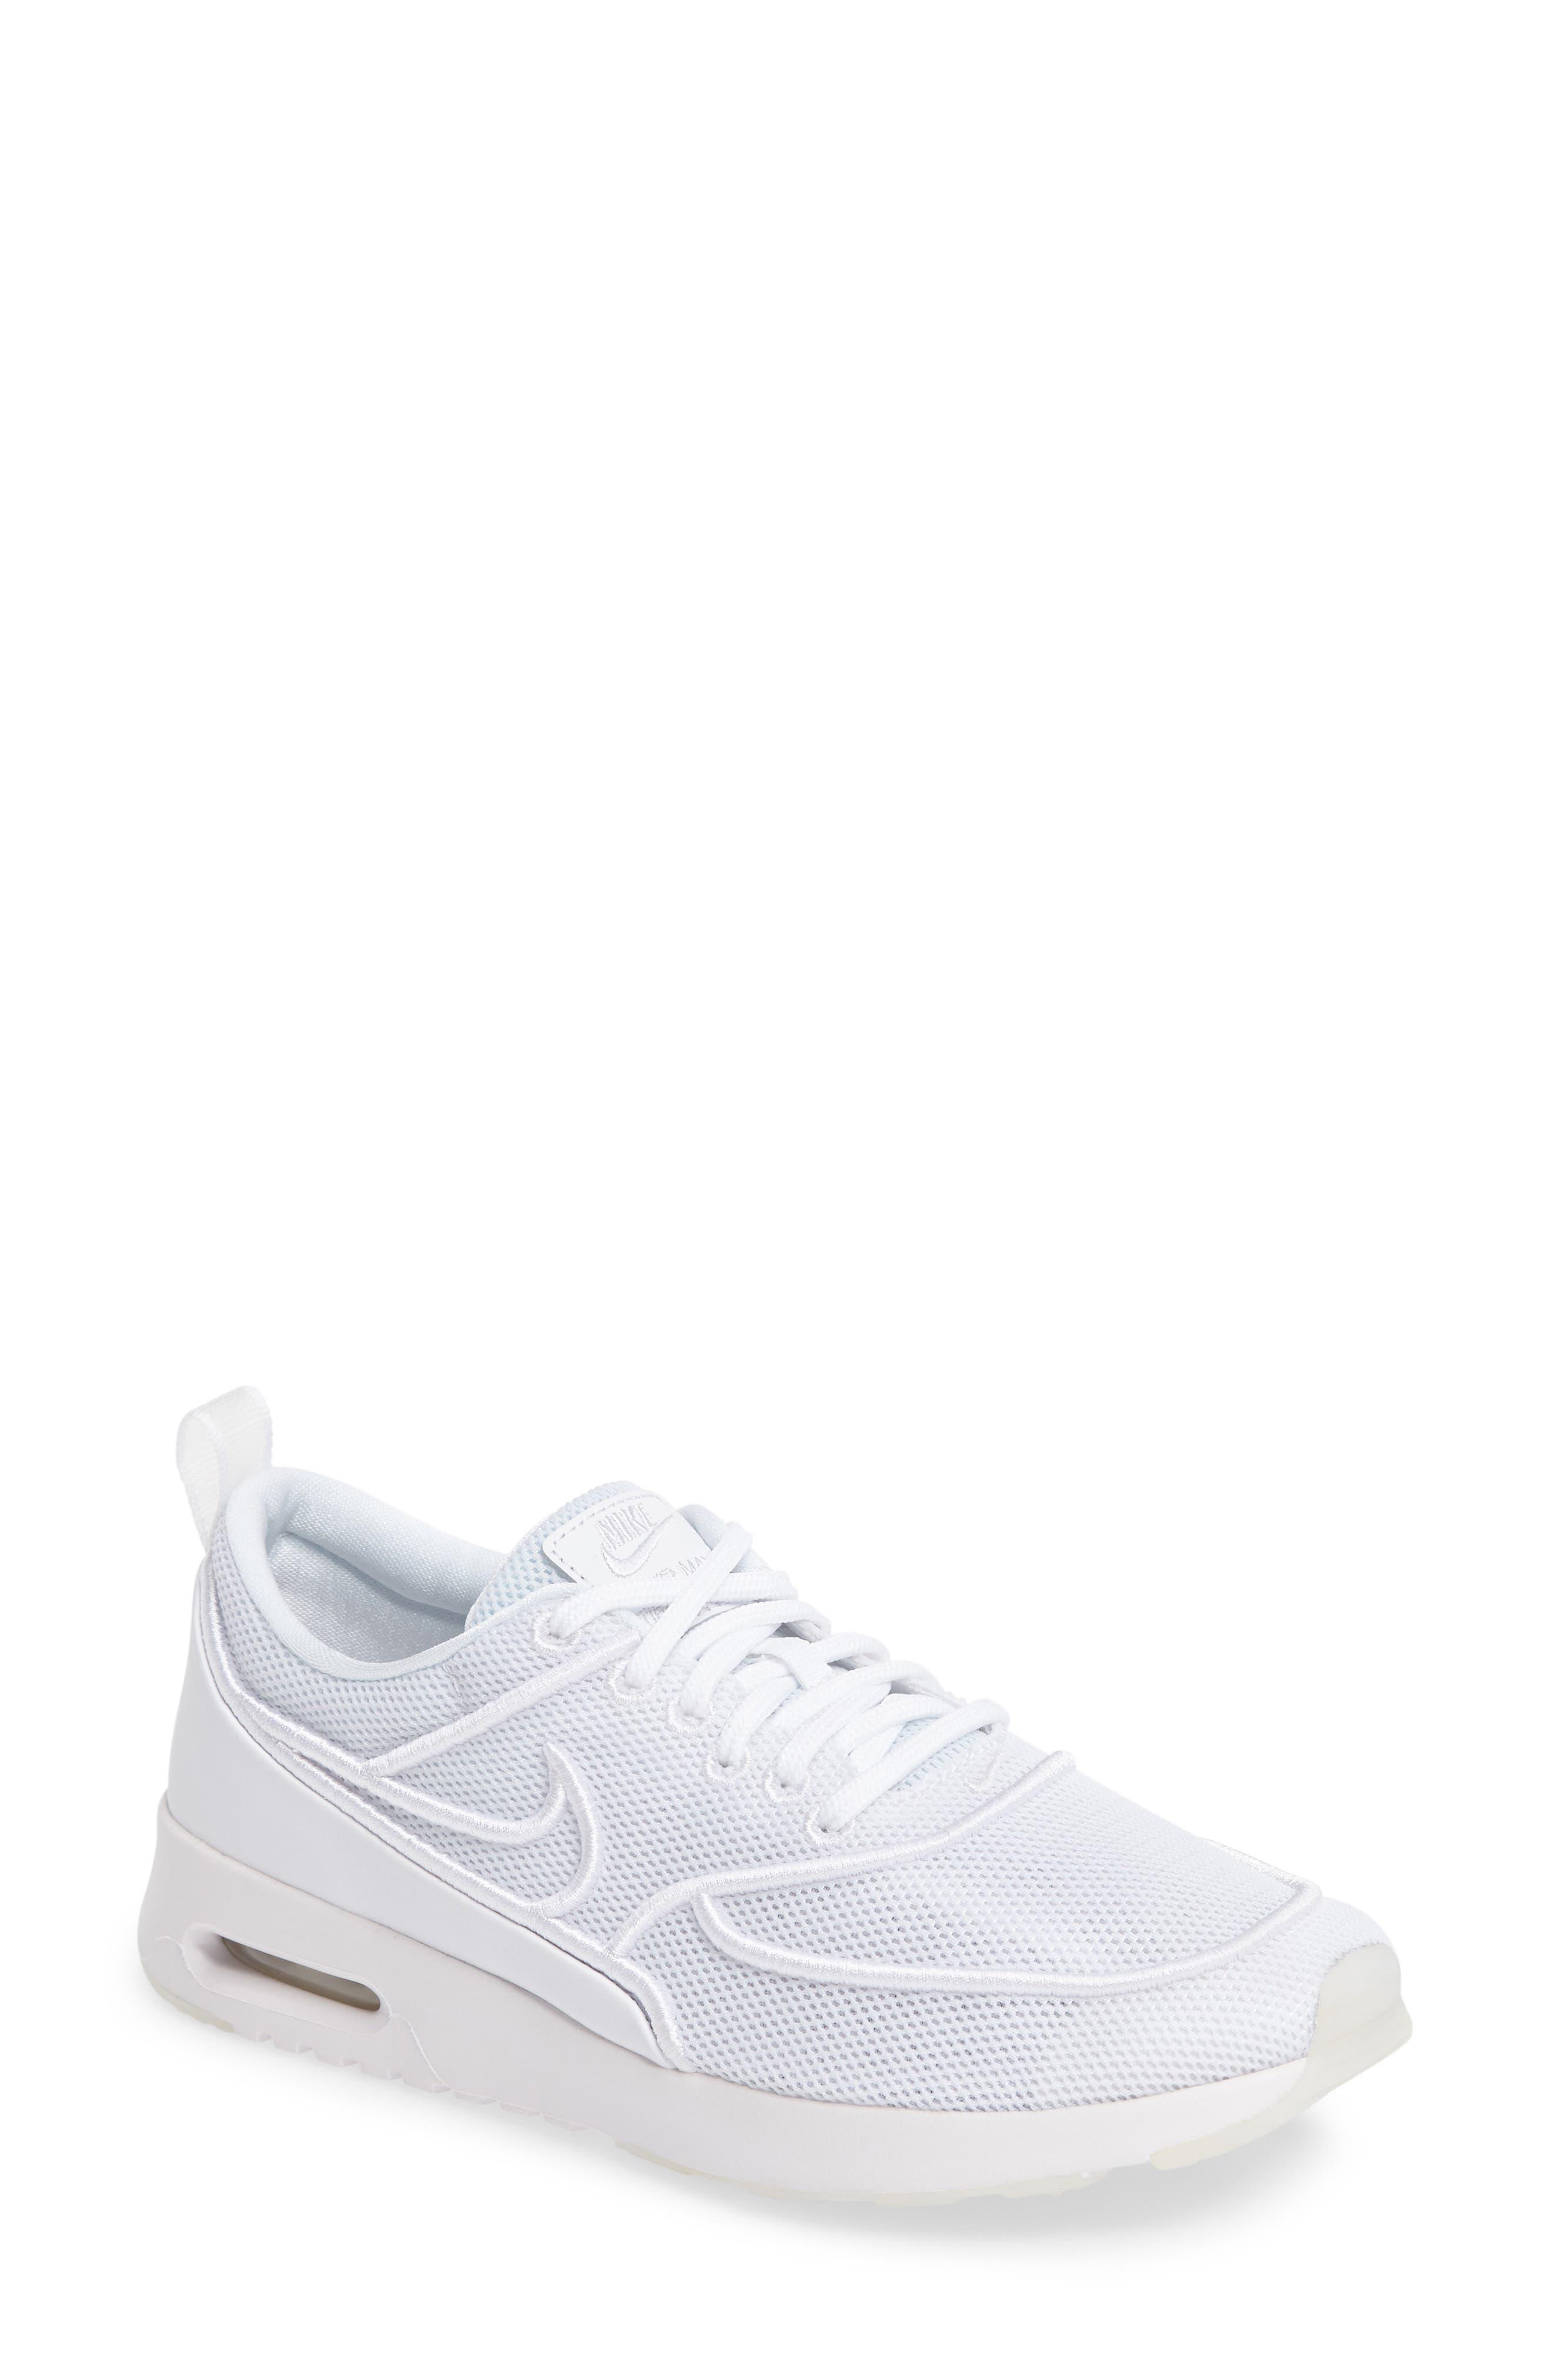 NIKE Air Max Thea Ultra SI Sneaker